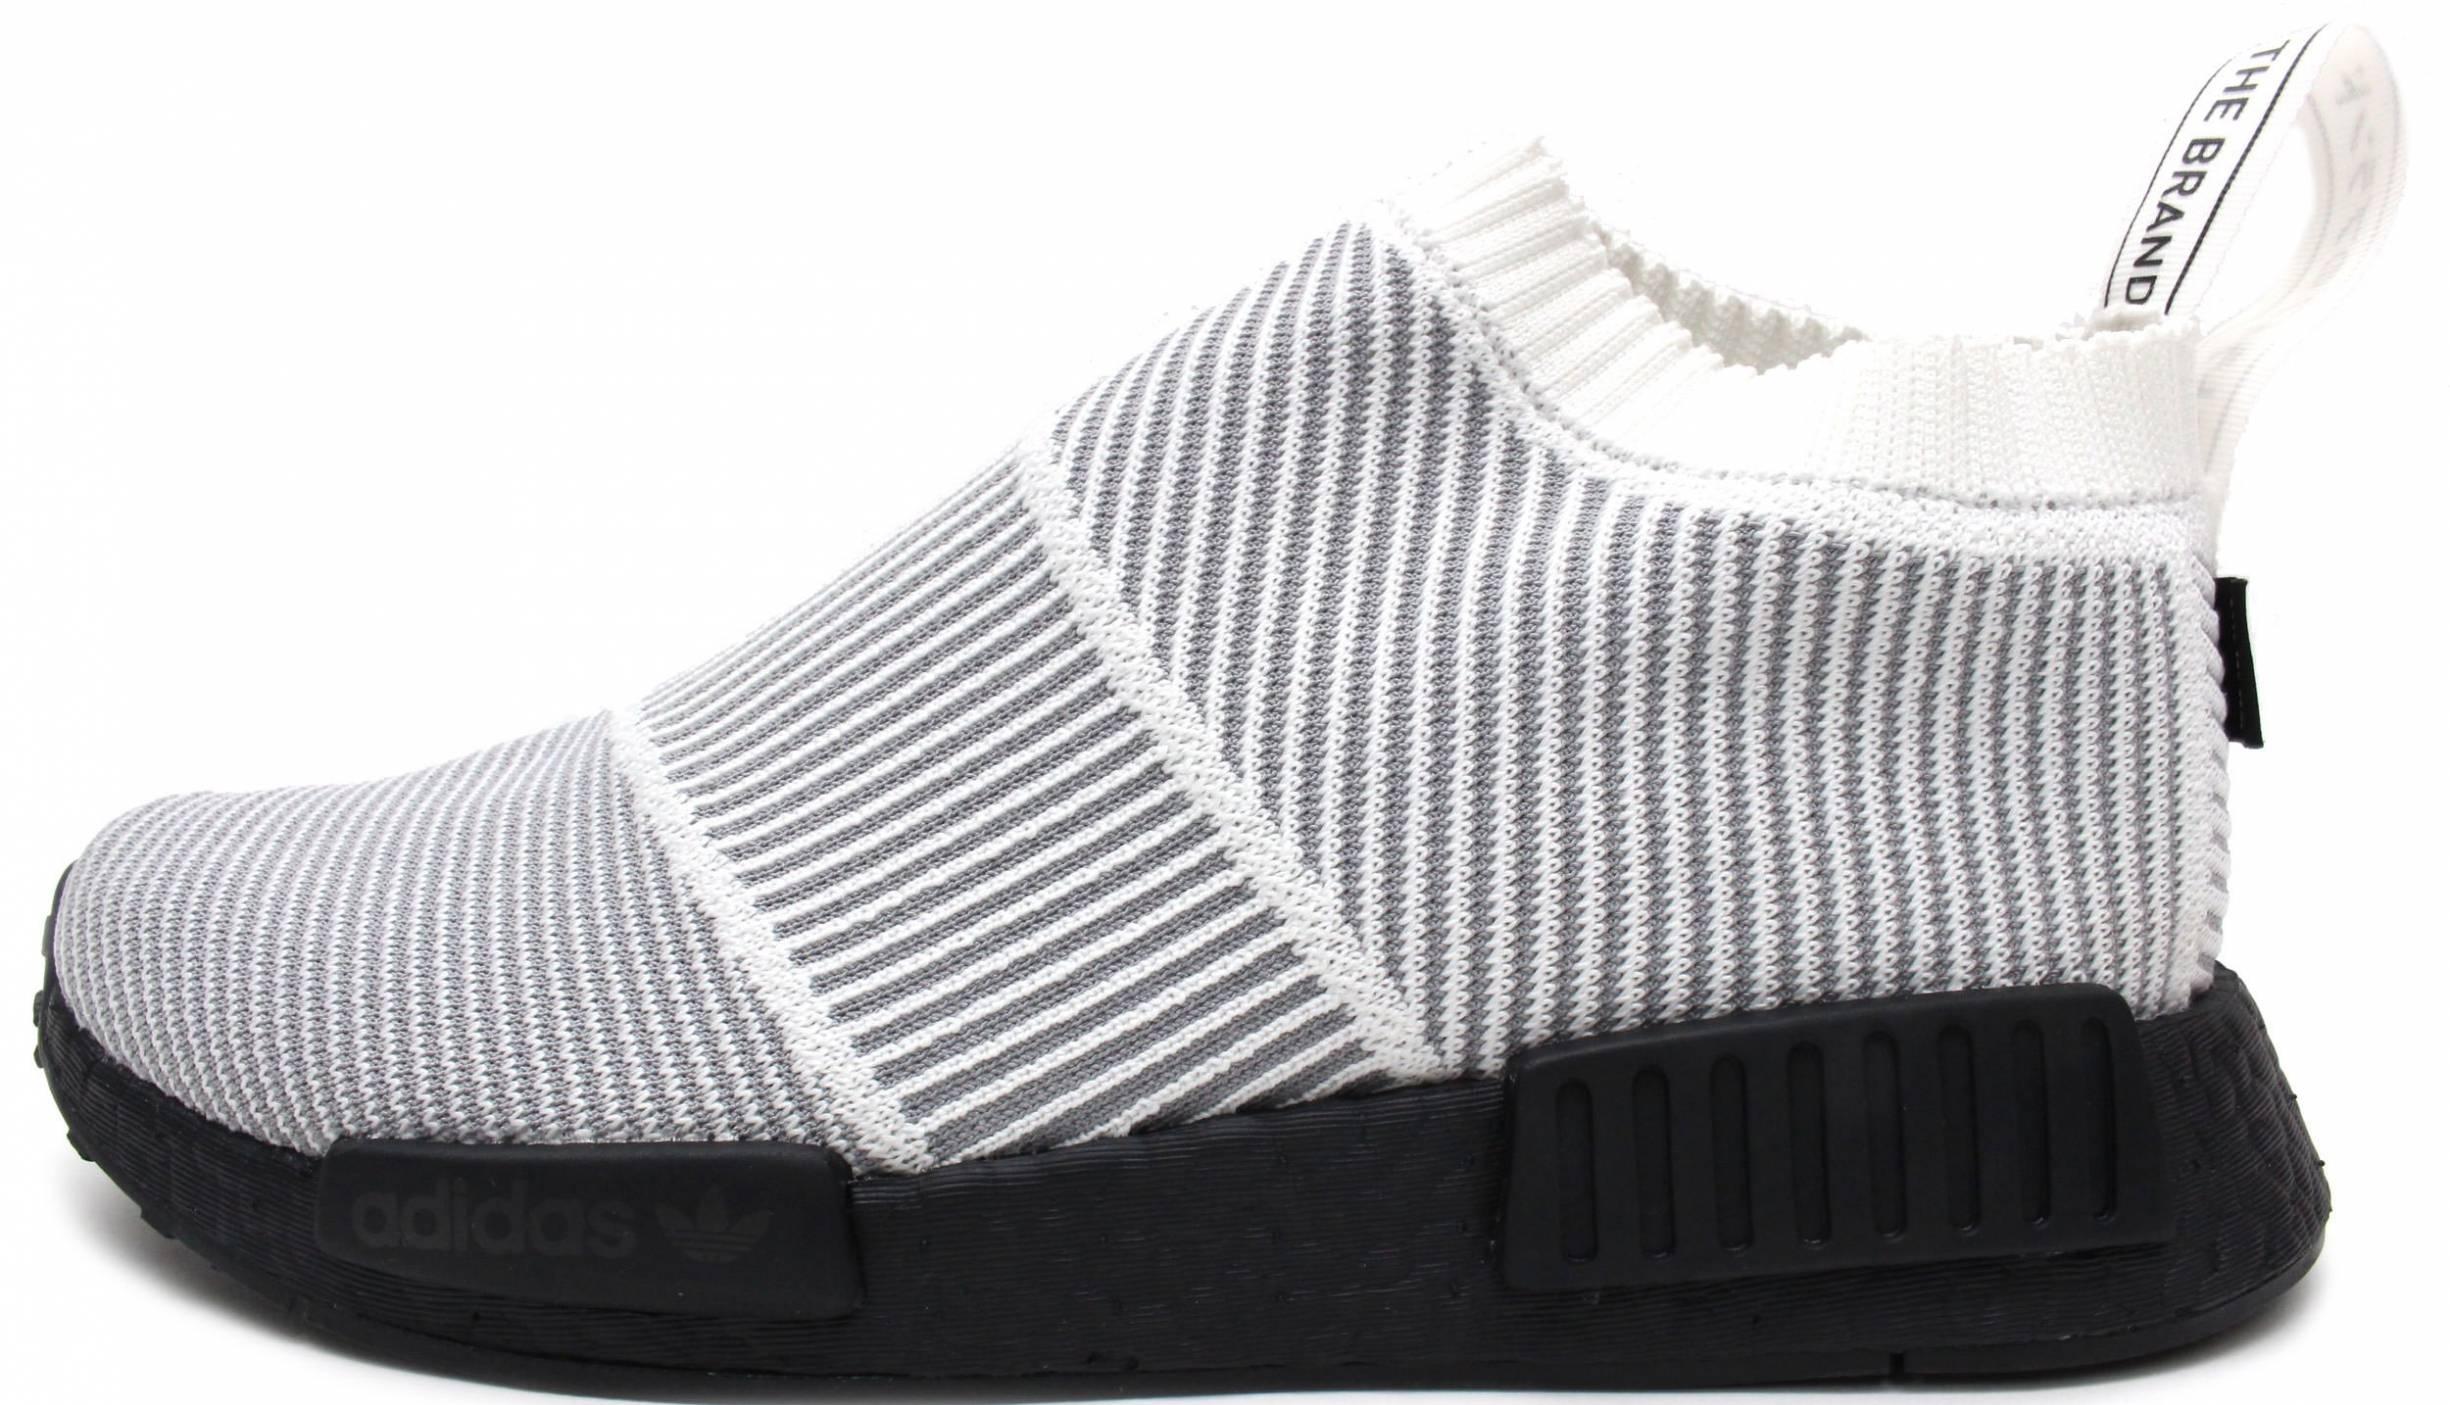 Adidas NMD_CS1 GTX Primeknit sneakers in grey | RunRepeat